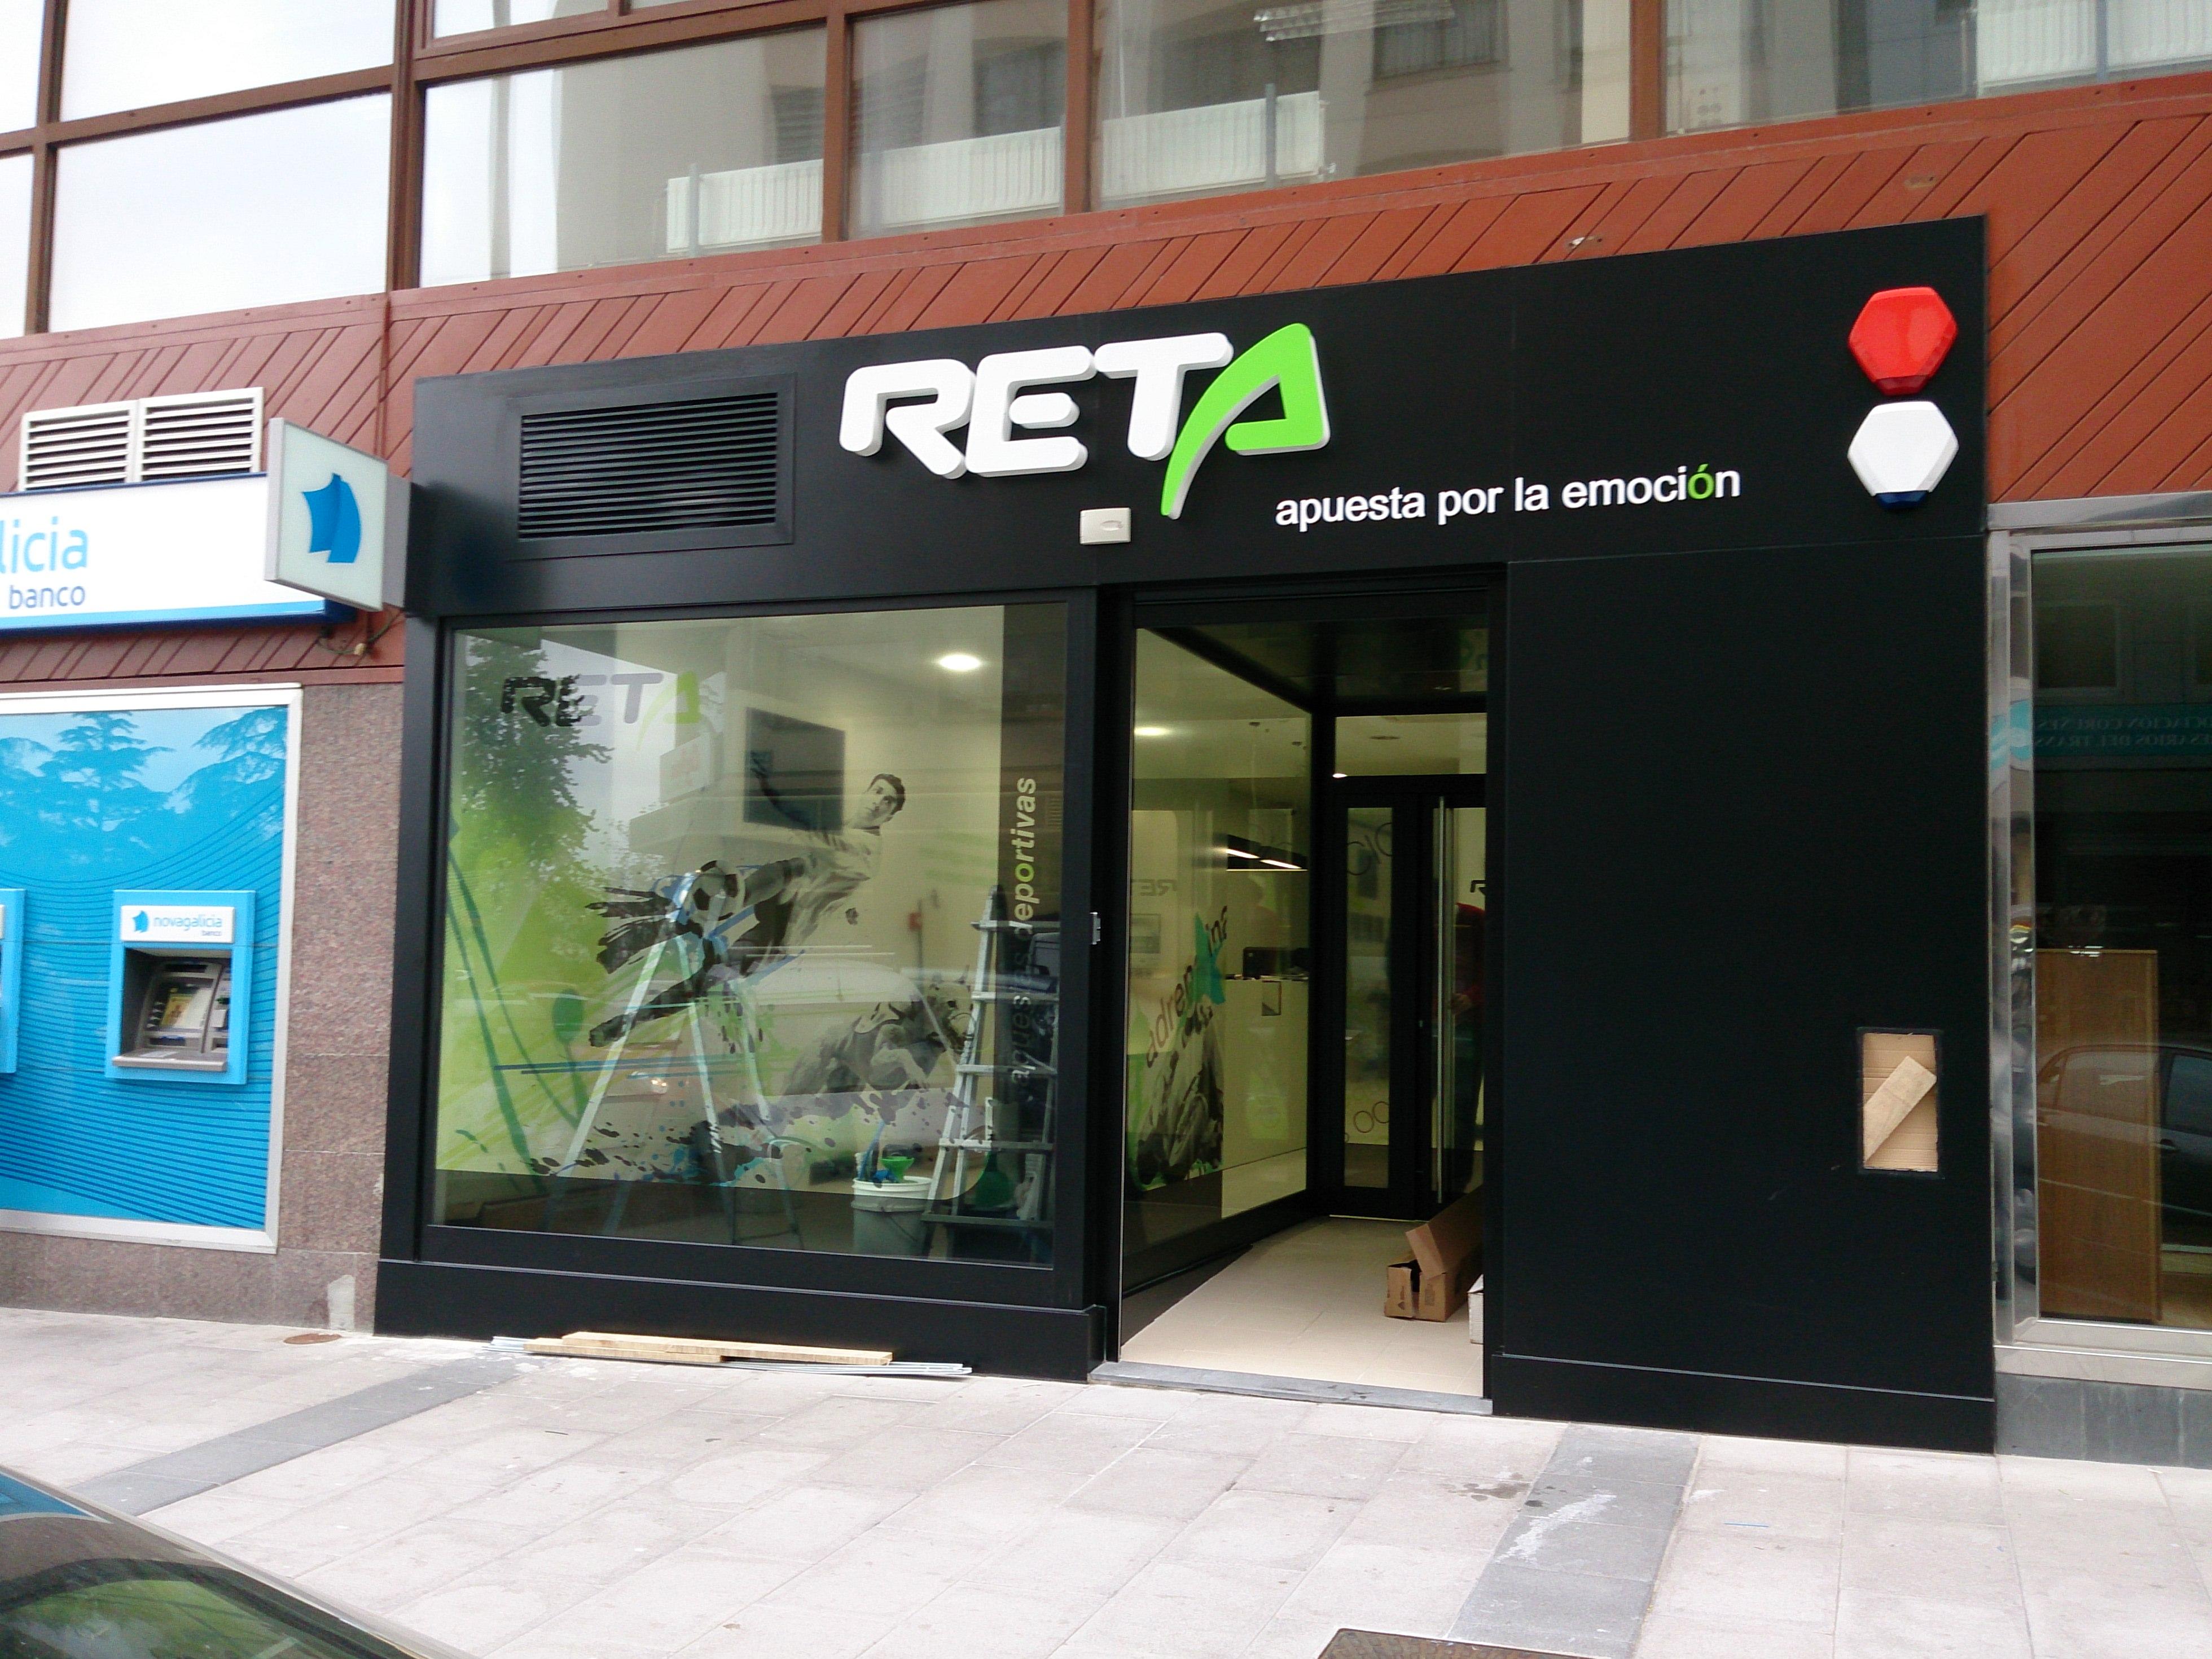 http://luzcoruna.es/wp-content/uploads/2020/03/2013-05-23-20.08.59-Reta-Coruña.jpg